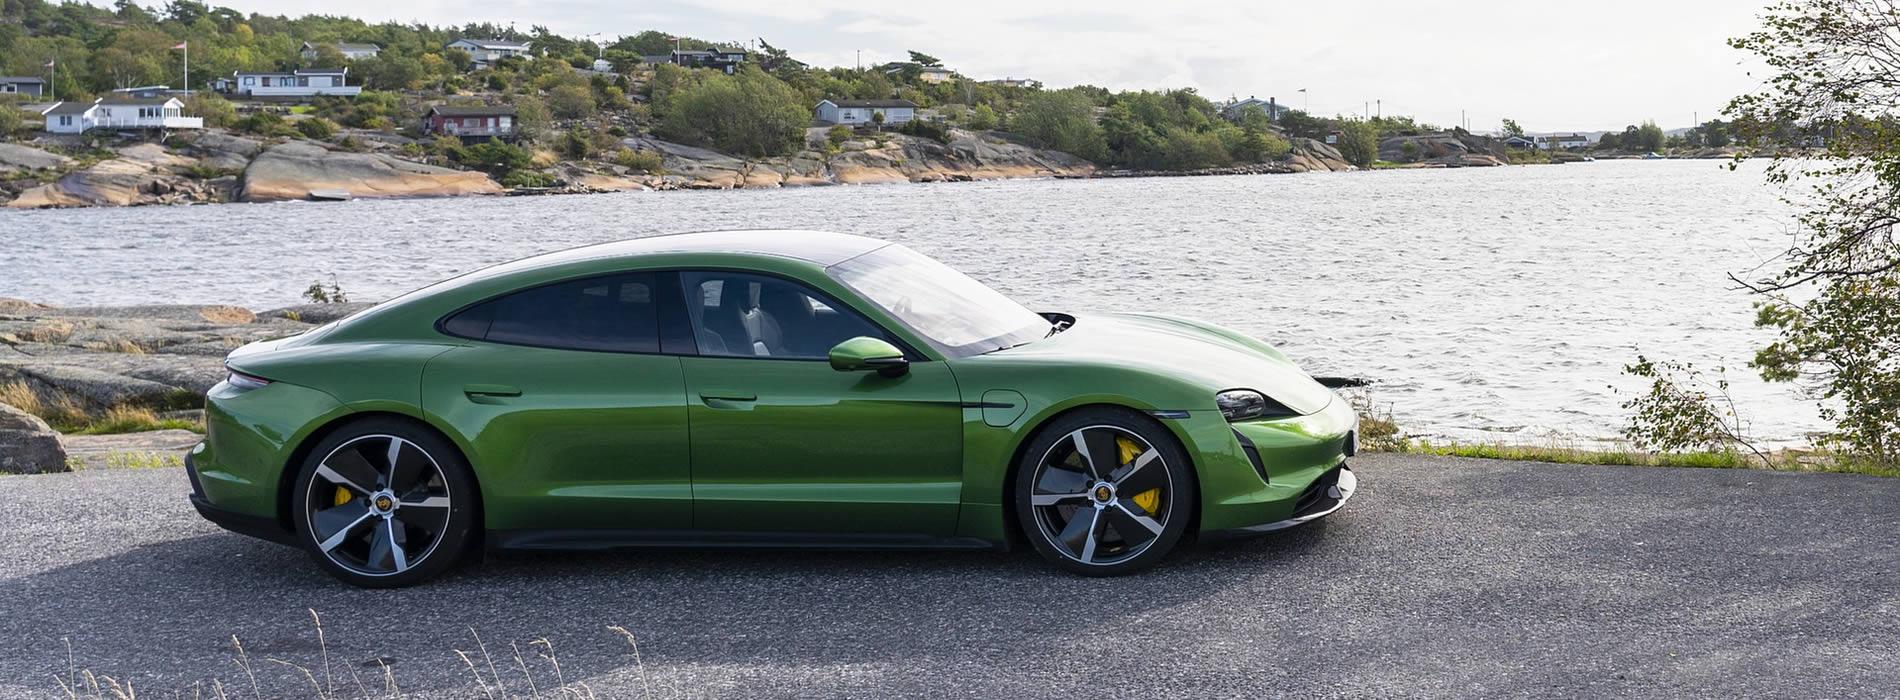 Noleggio lungo termine Porsche Taycan Turbo